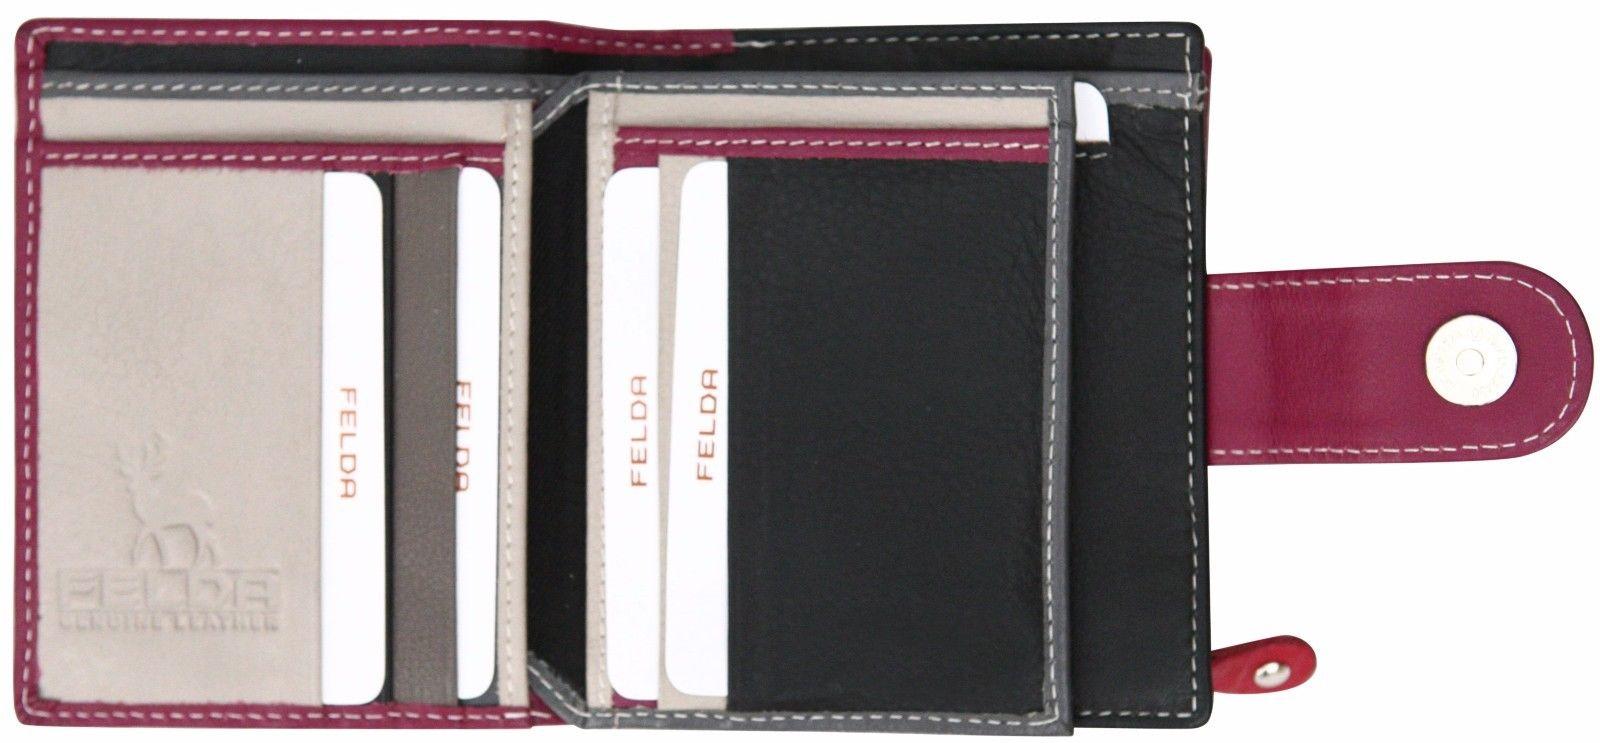 Felda-RFID-onorevoli-MEDAGLIA-amp-Card-Purse-Wallet-Genuine-Leather-Multi-SOFT-BOX-REGALO miniatura 45